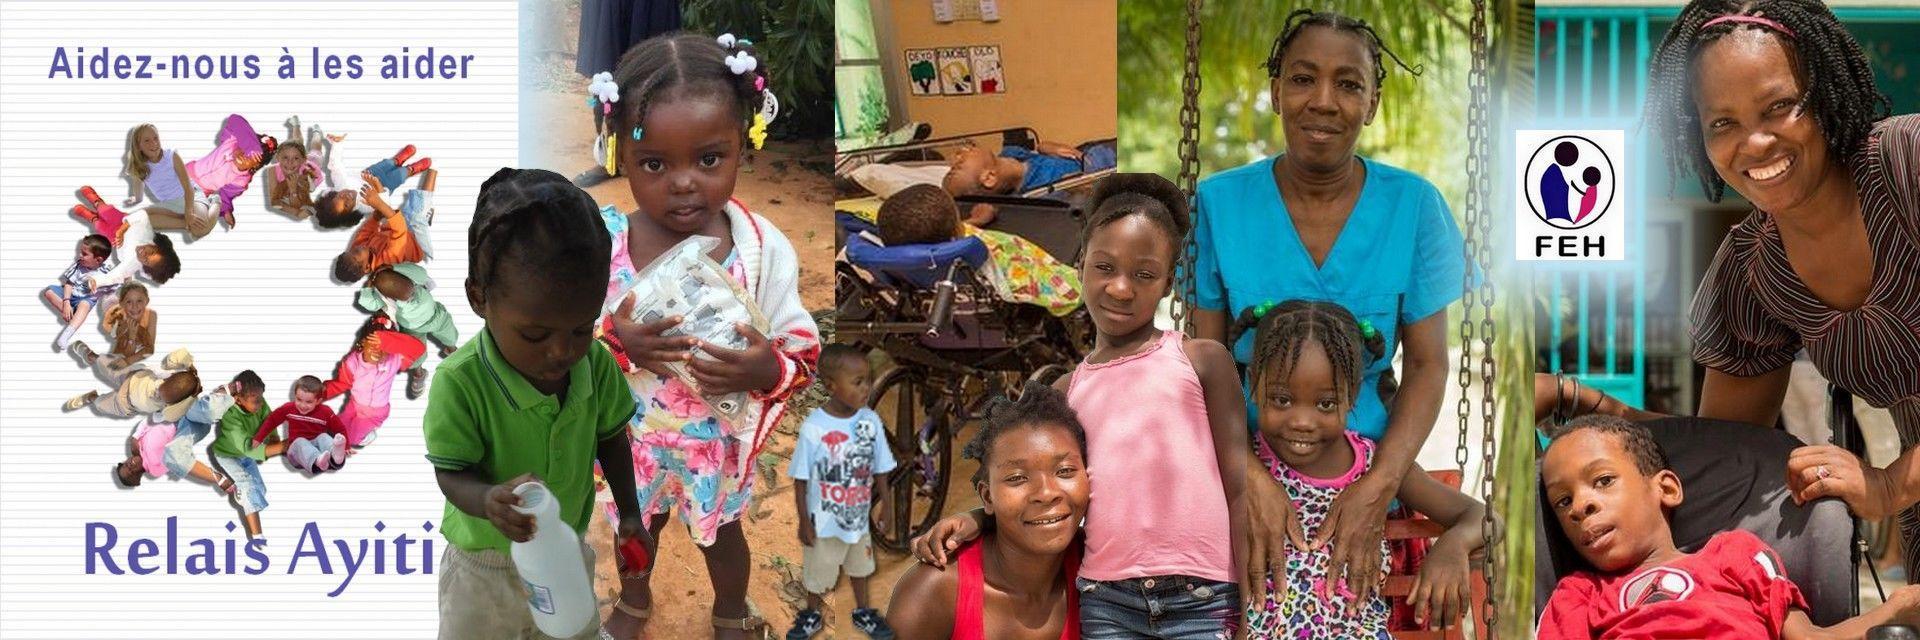 Association Relais Ayiti